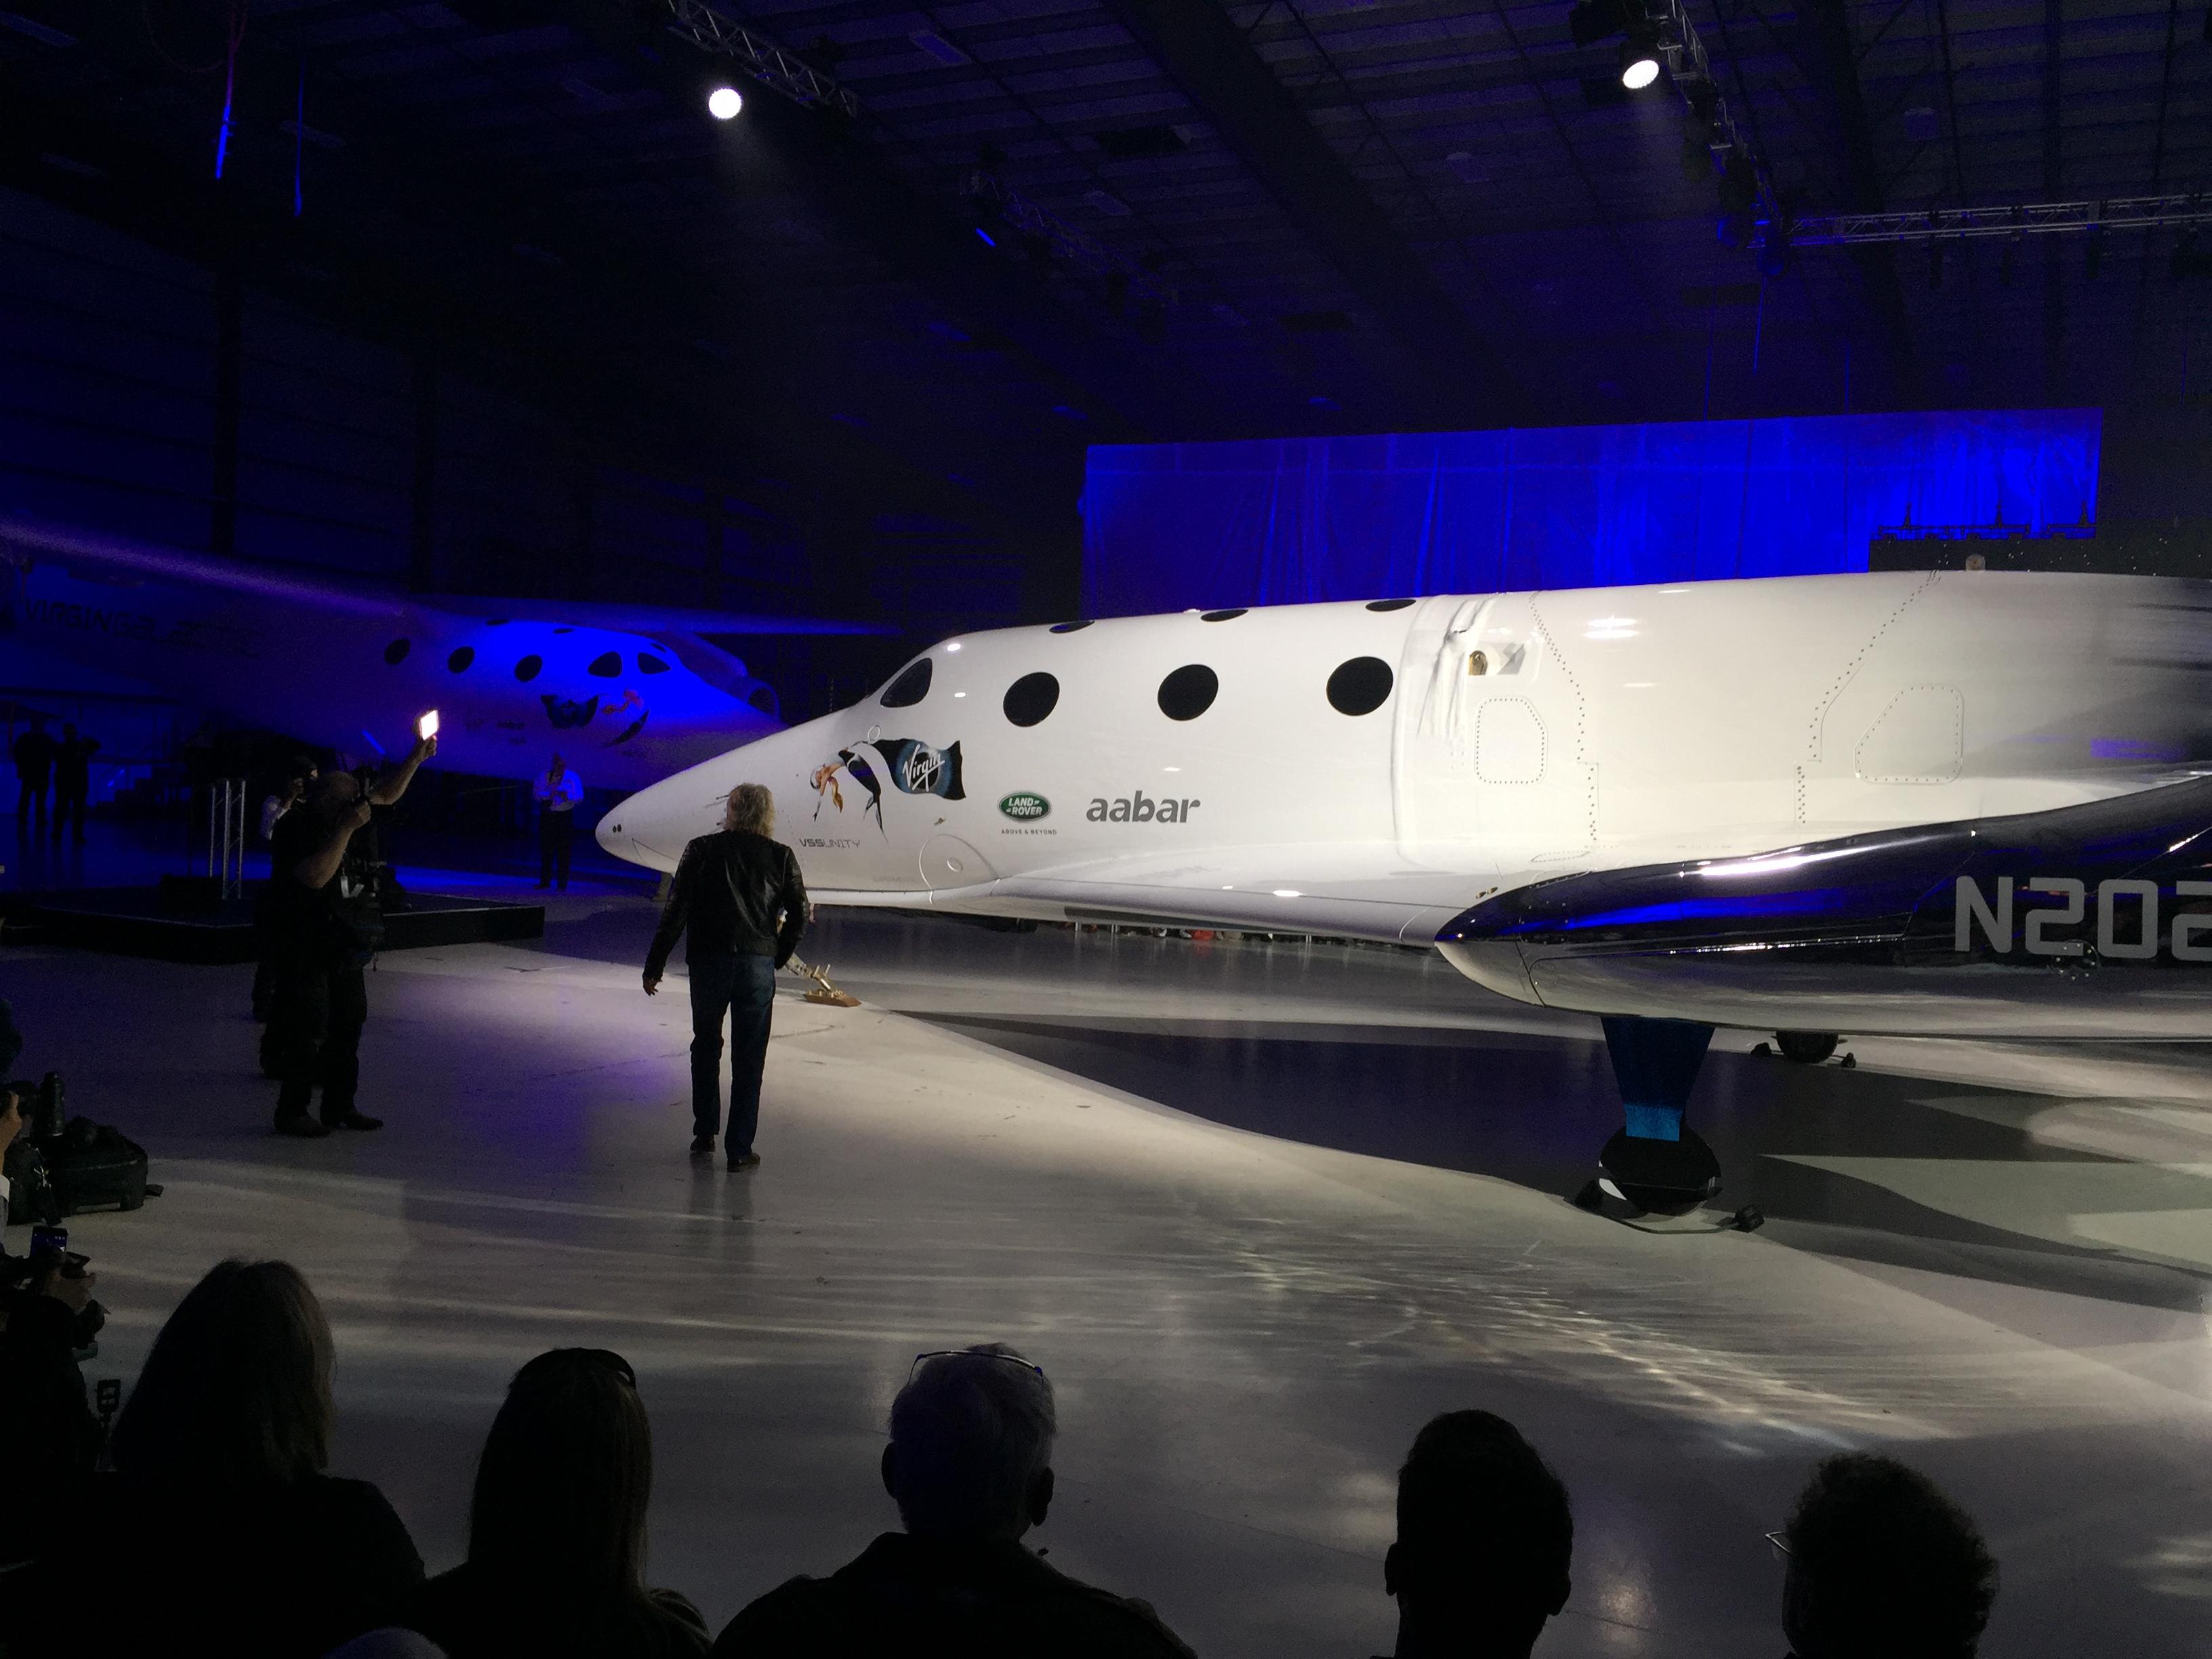 Stephen Hawking Wants to Ride Virgin Galactic's New Passenger Spaceship